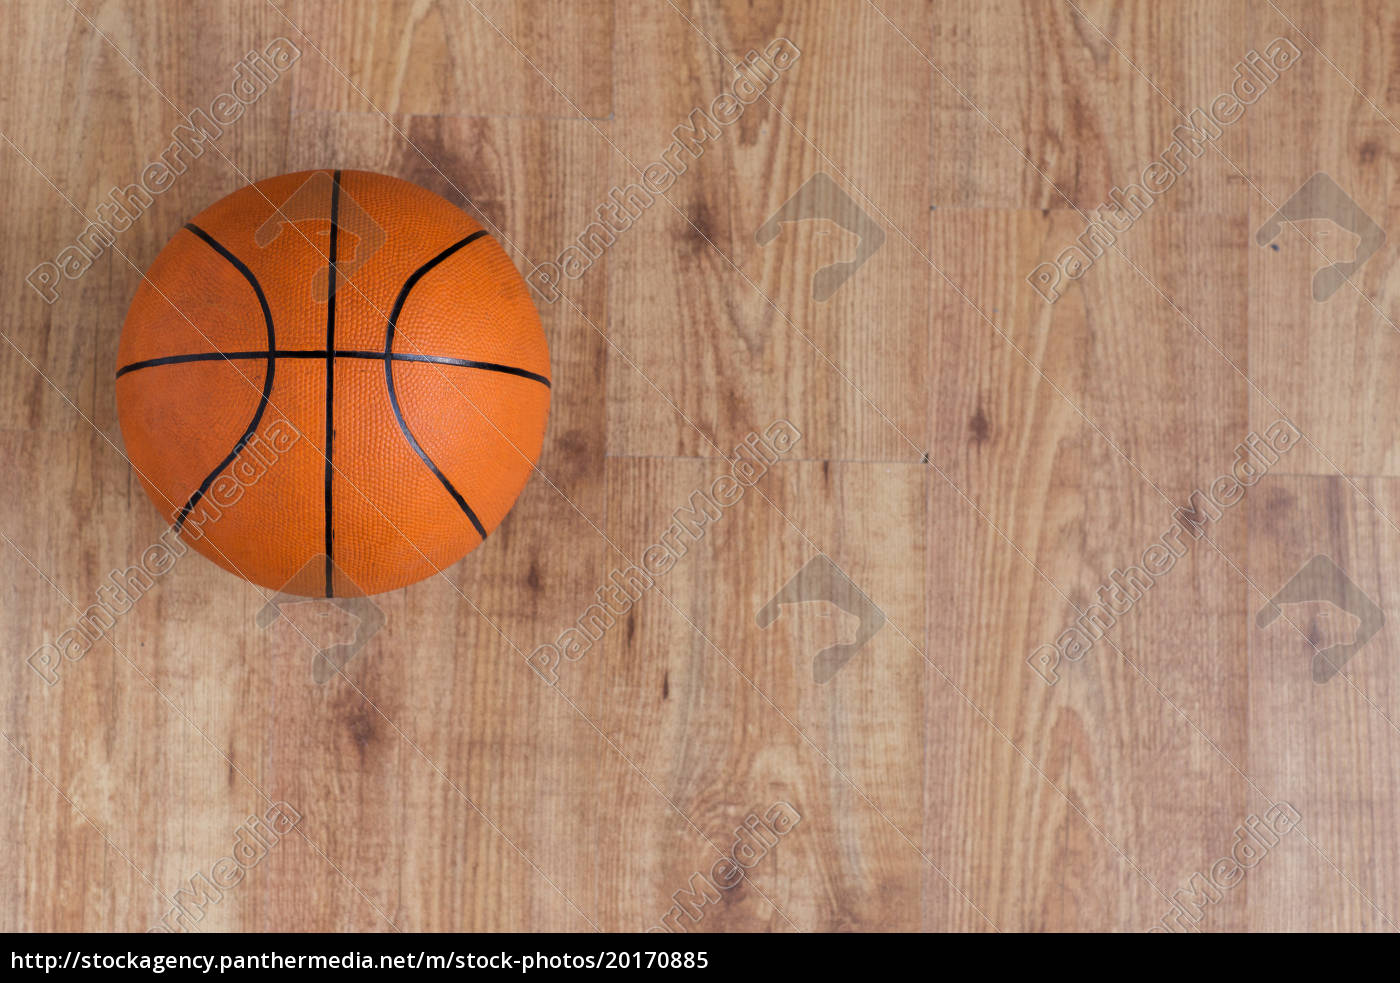 close, up, of, basketball, ball, on - 20170885